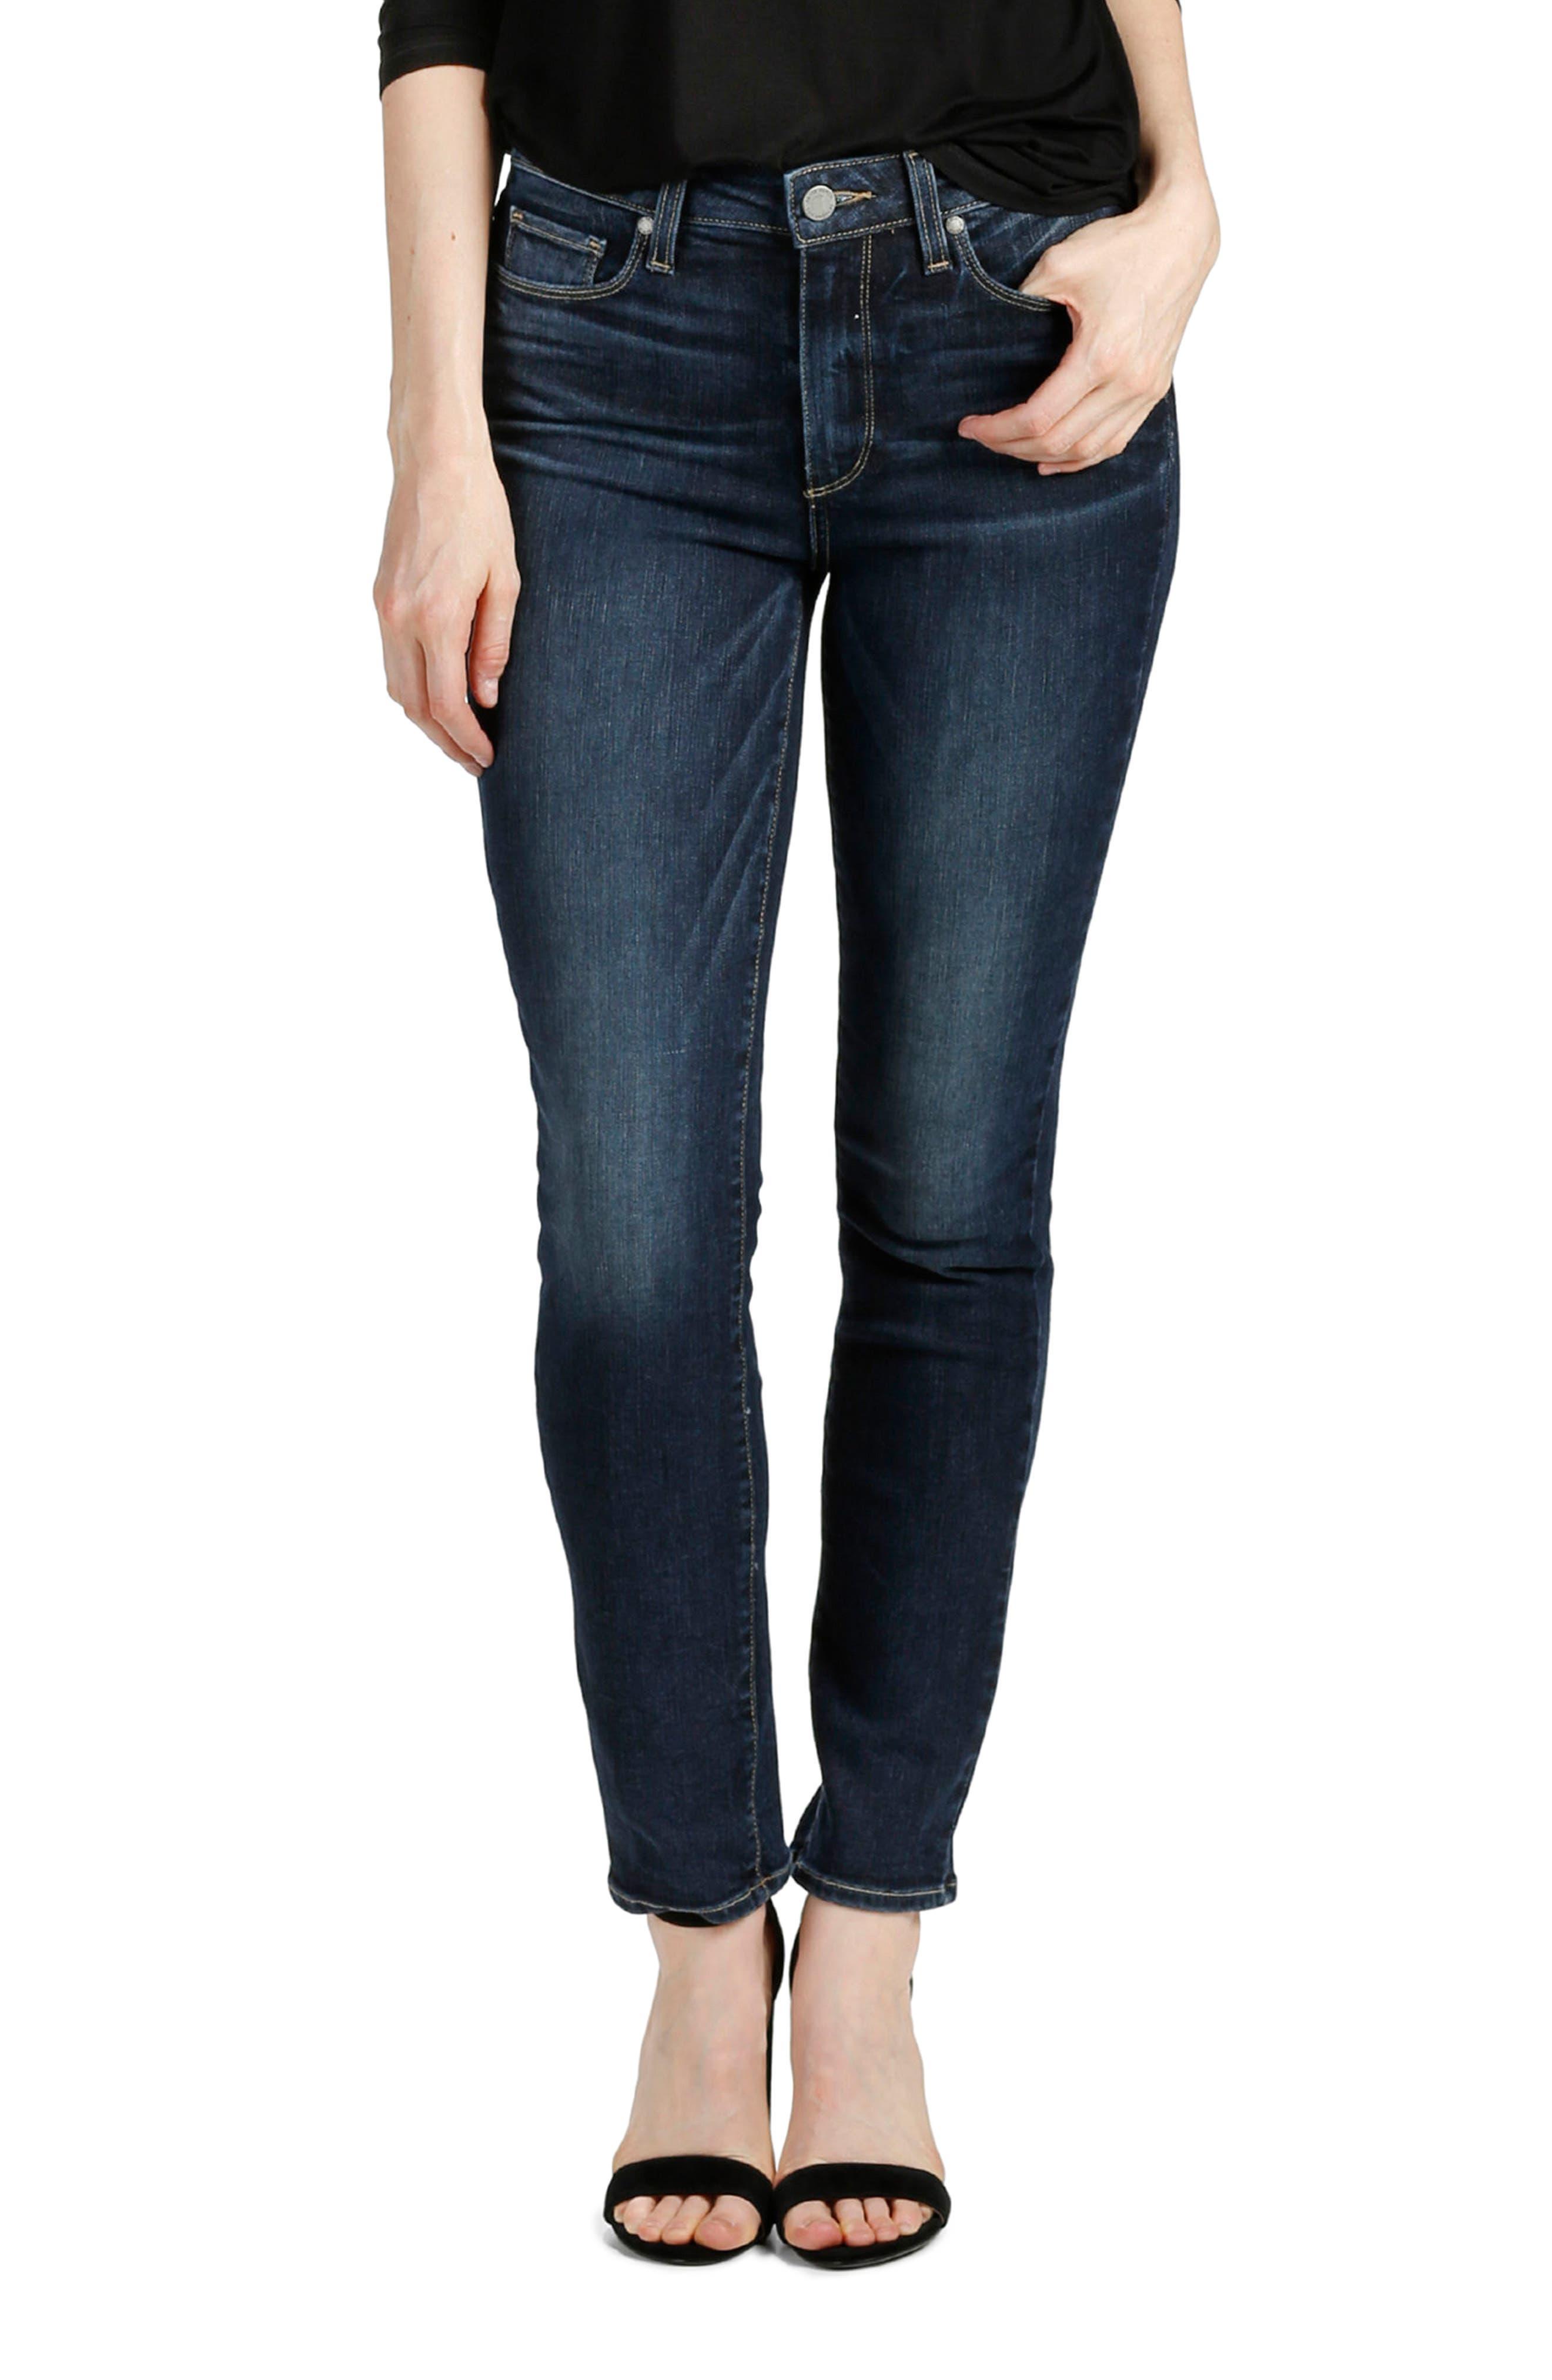 Transcend Vintage - Hoxton Ankle Peg Skinny Jeans,                         Main,                         color, Jerry Girl